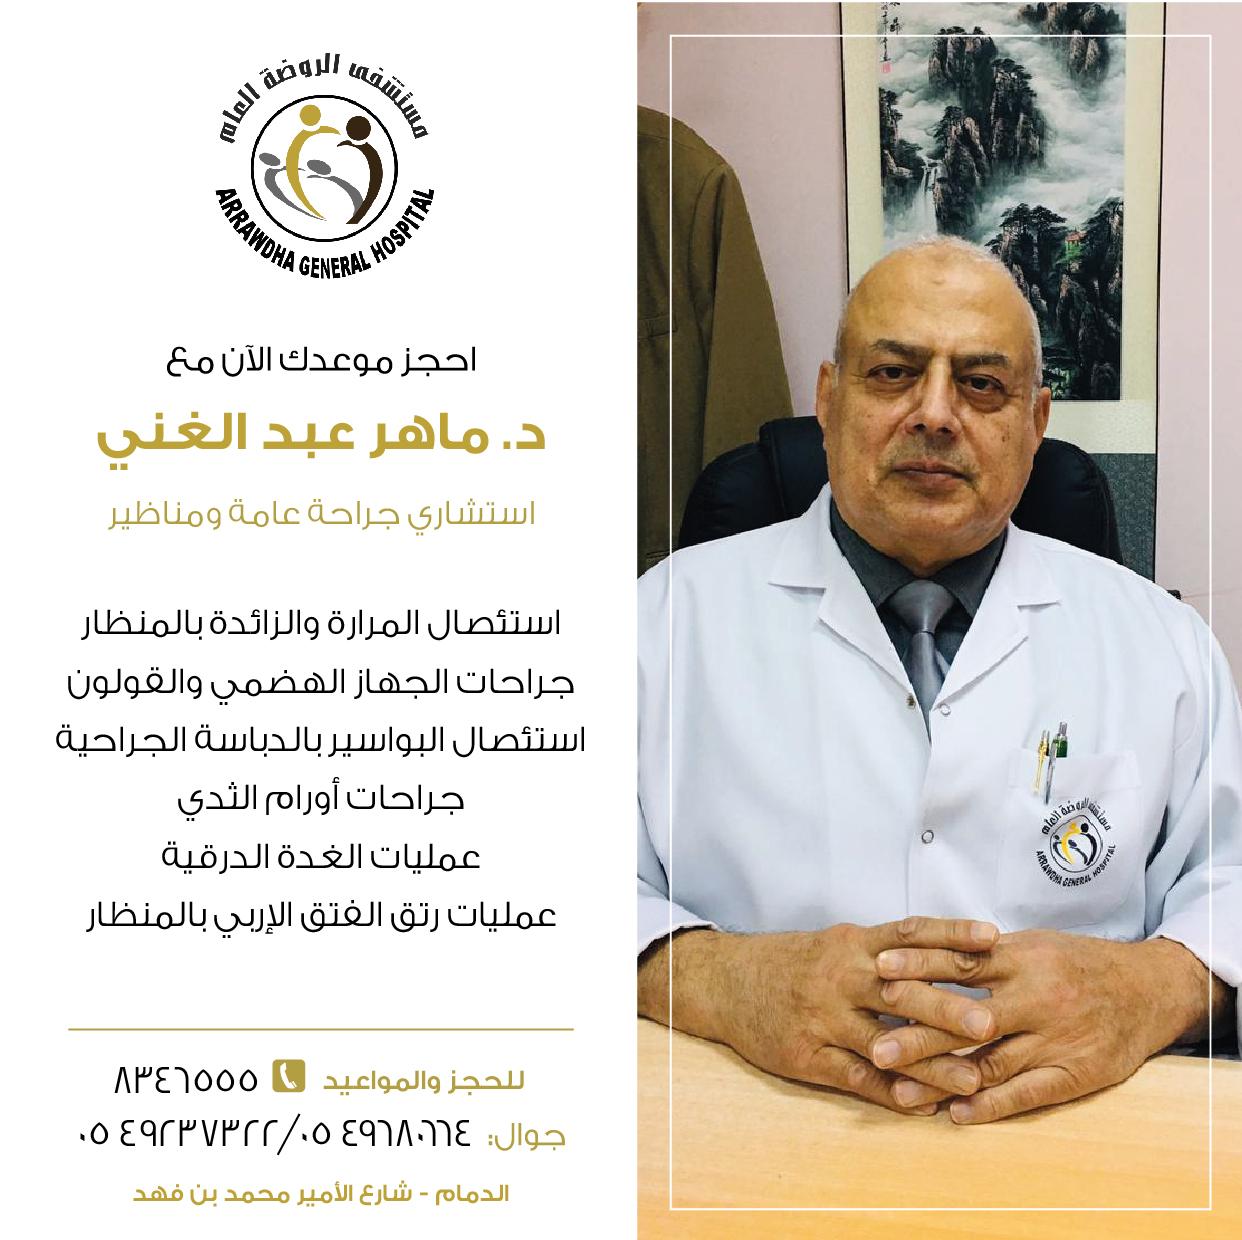 Dr. Maher Abdul ghani